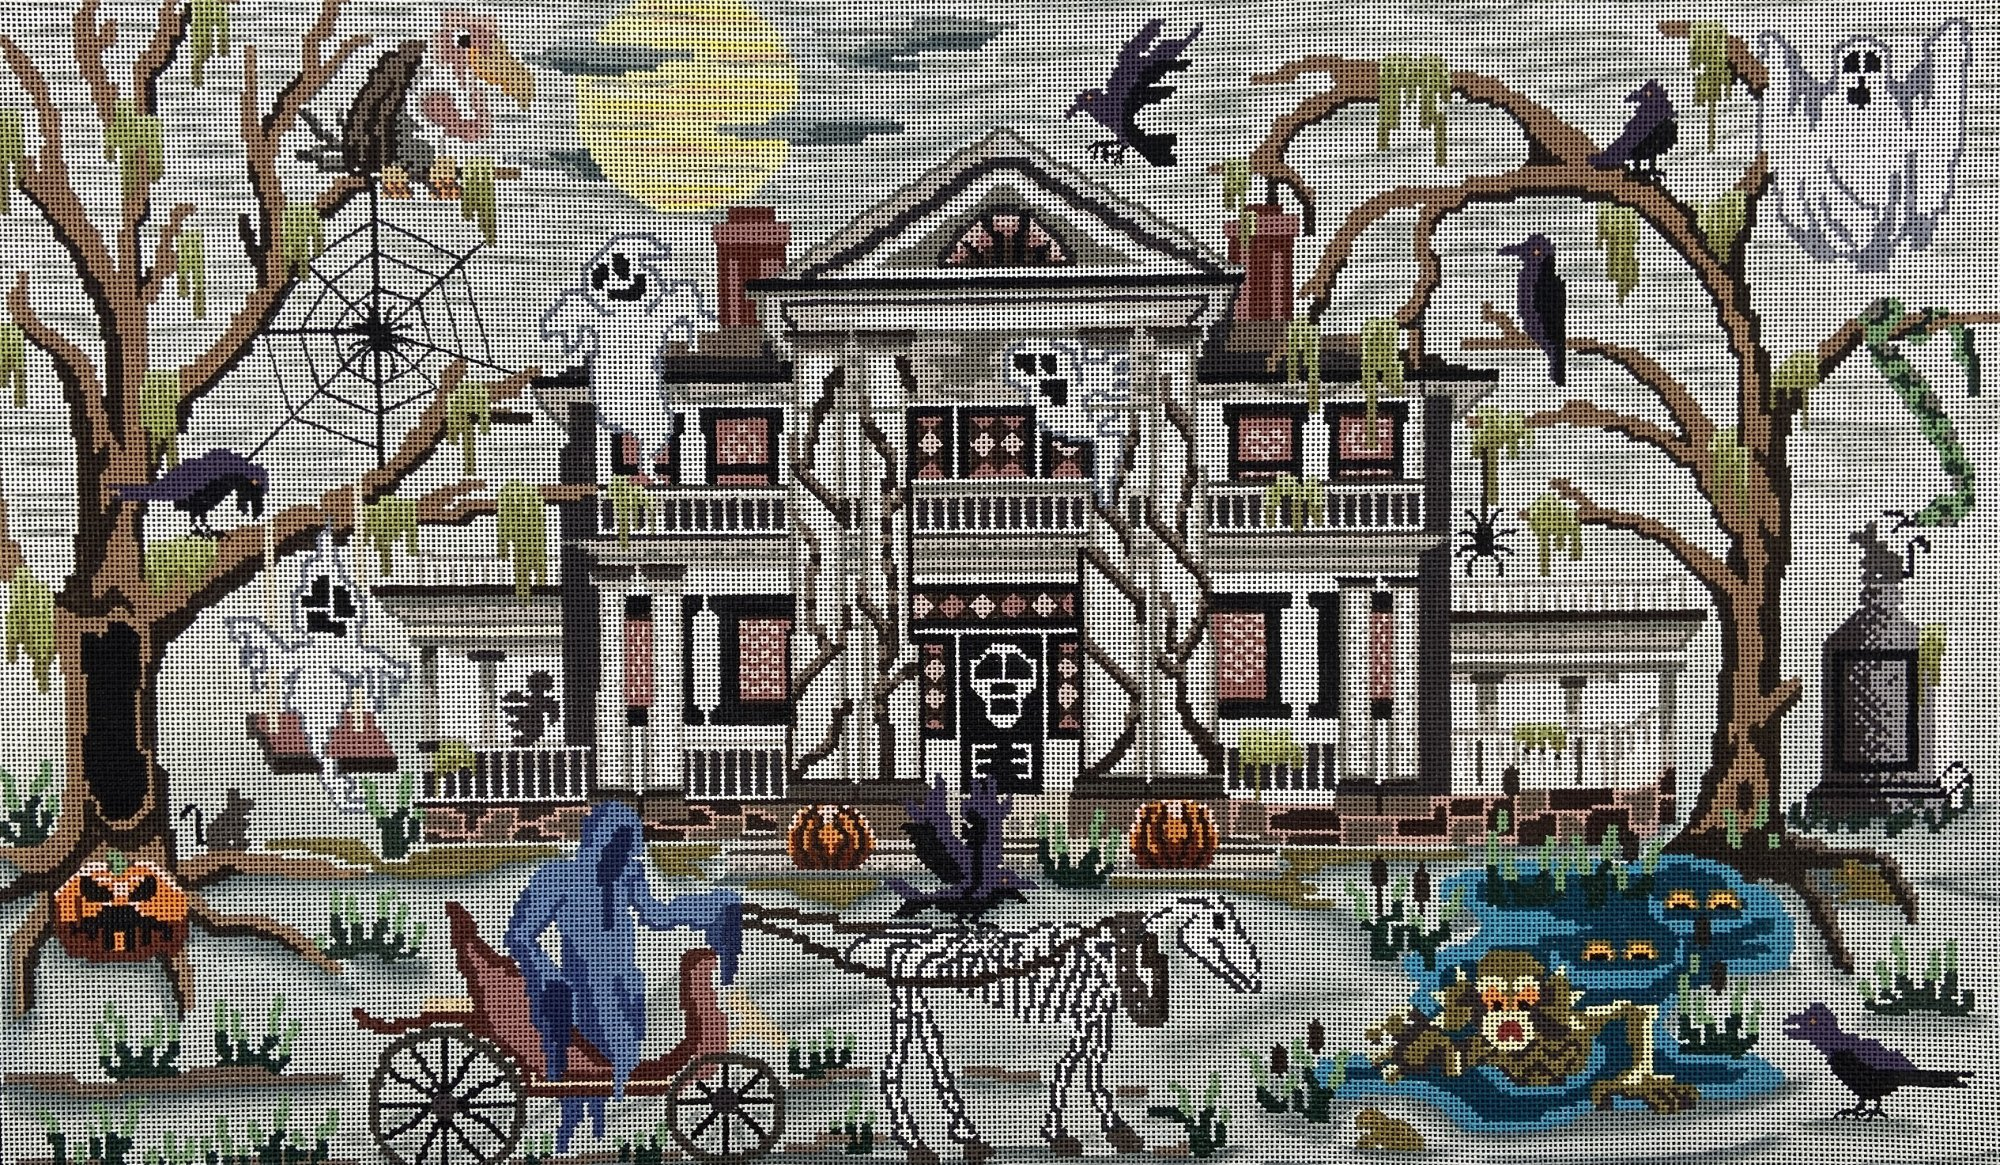 GC01 Phantom Plantation Haunted Halloween House Love You More